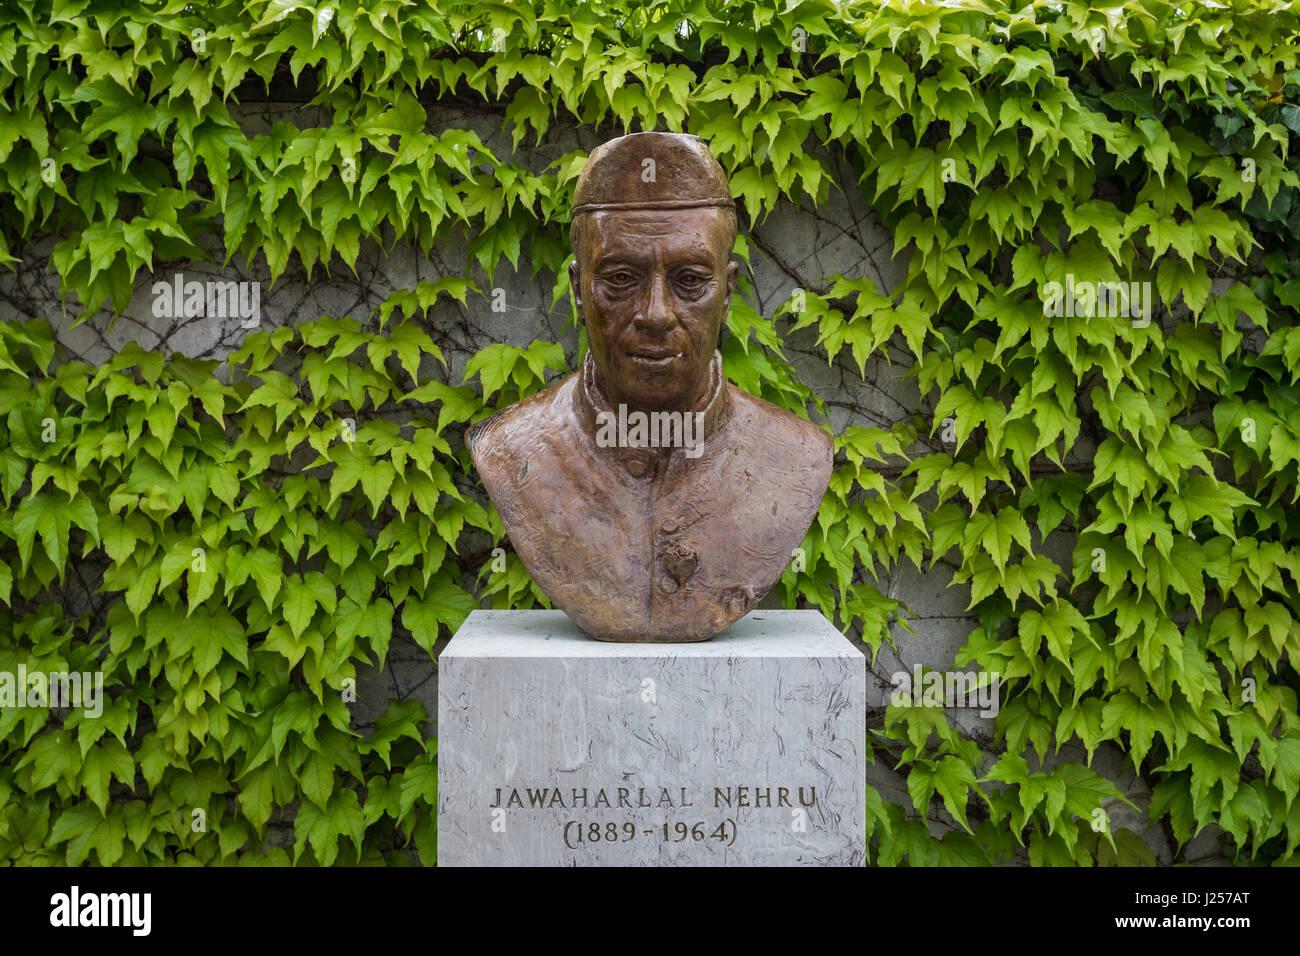 A bust of Jawaharlal Nehru (first Prime Minister of India) at Dobrovo, Goriska Brda, Slovenia - Stock Image